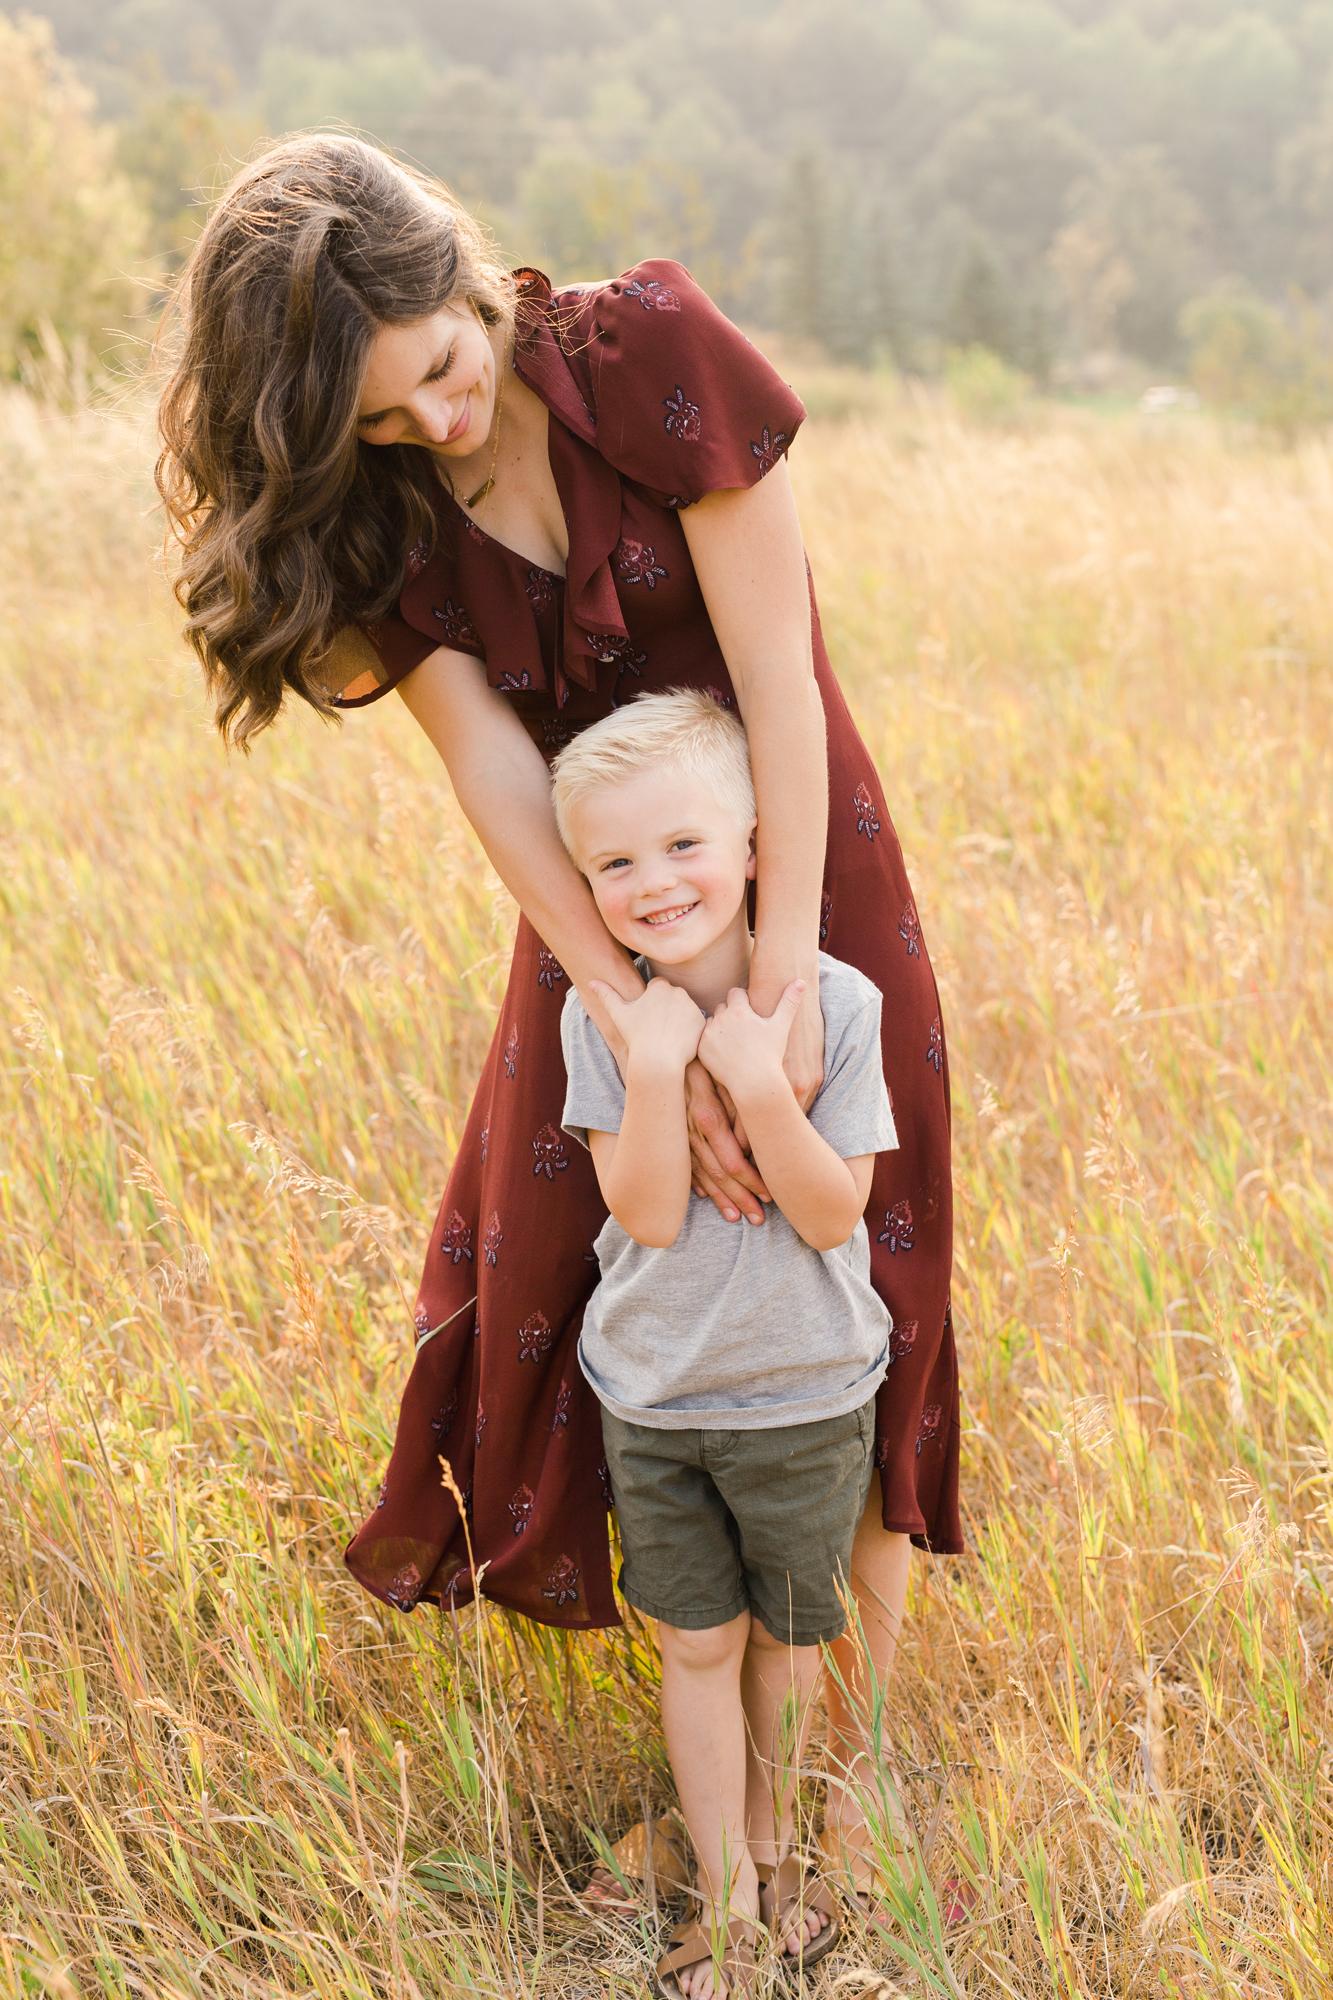 utahfamilyphotography_0024.jpg